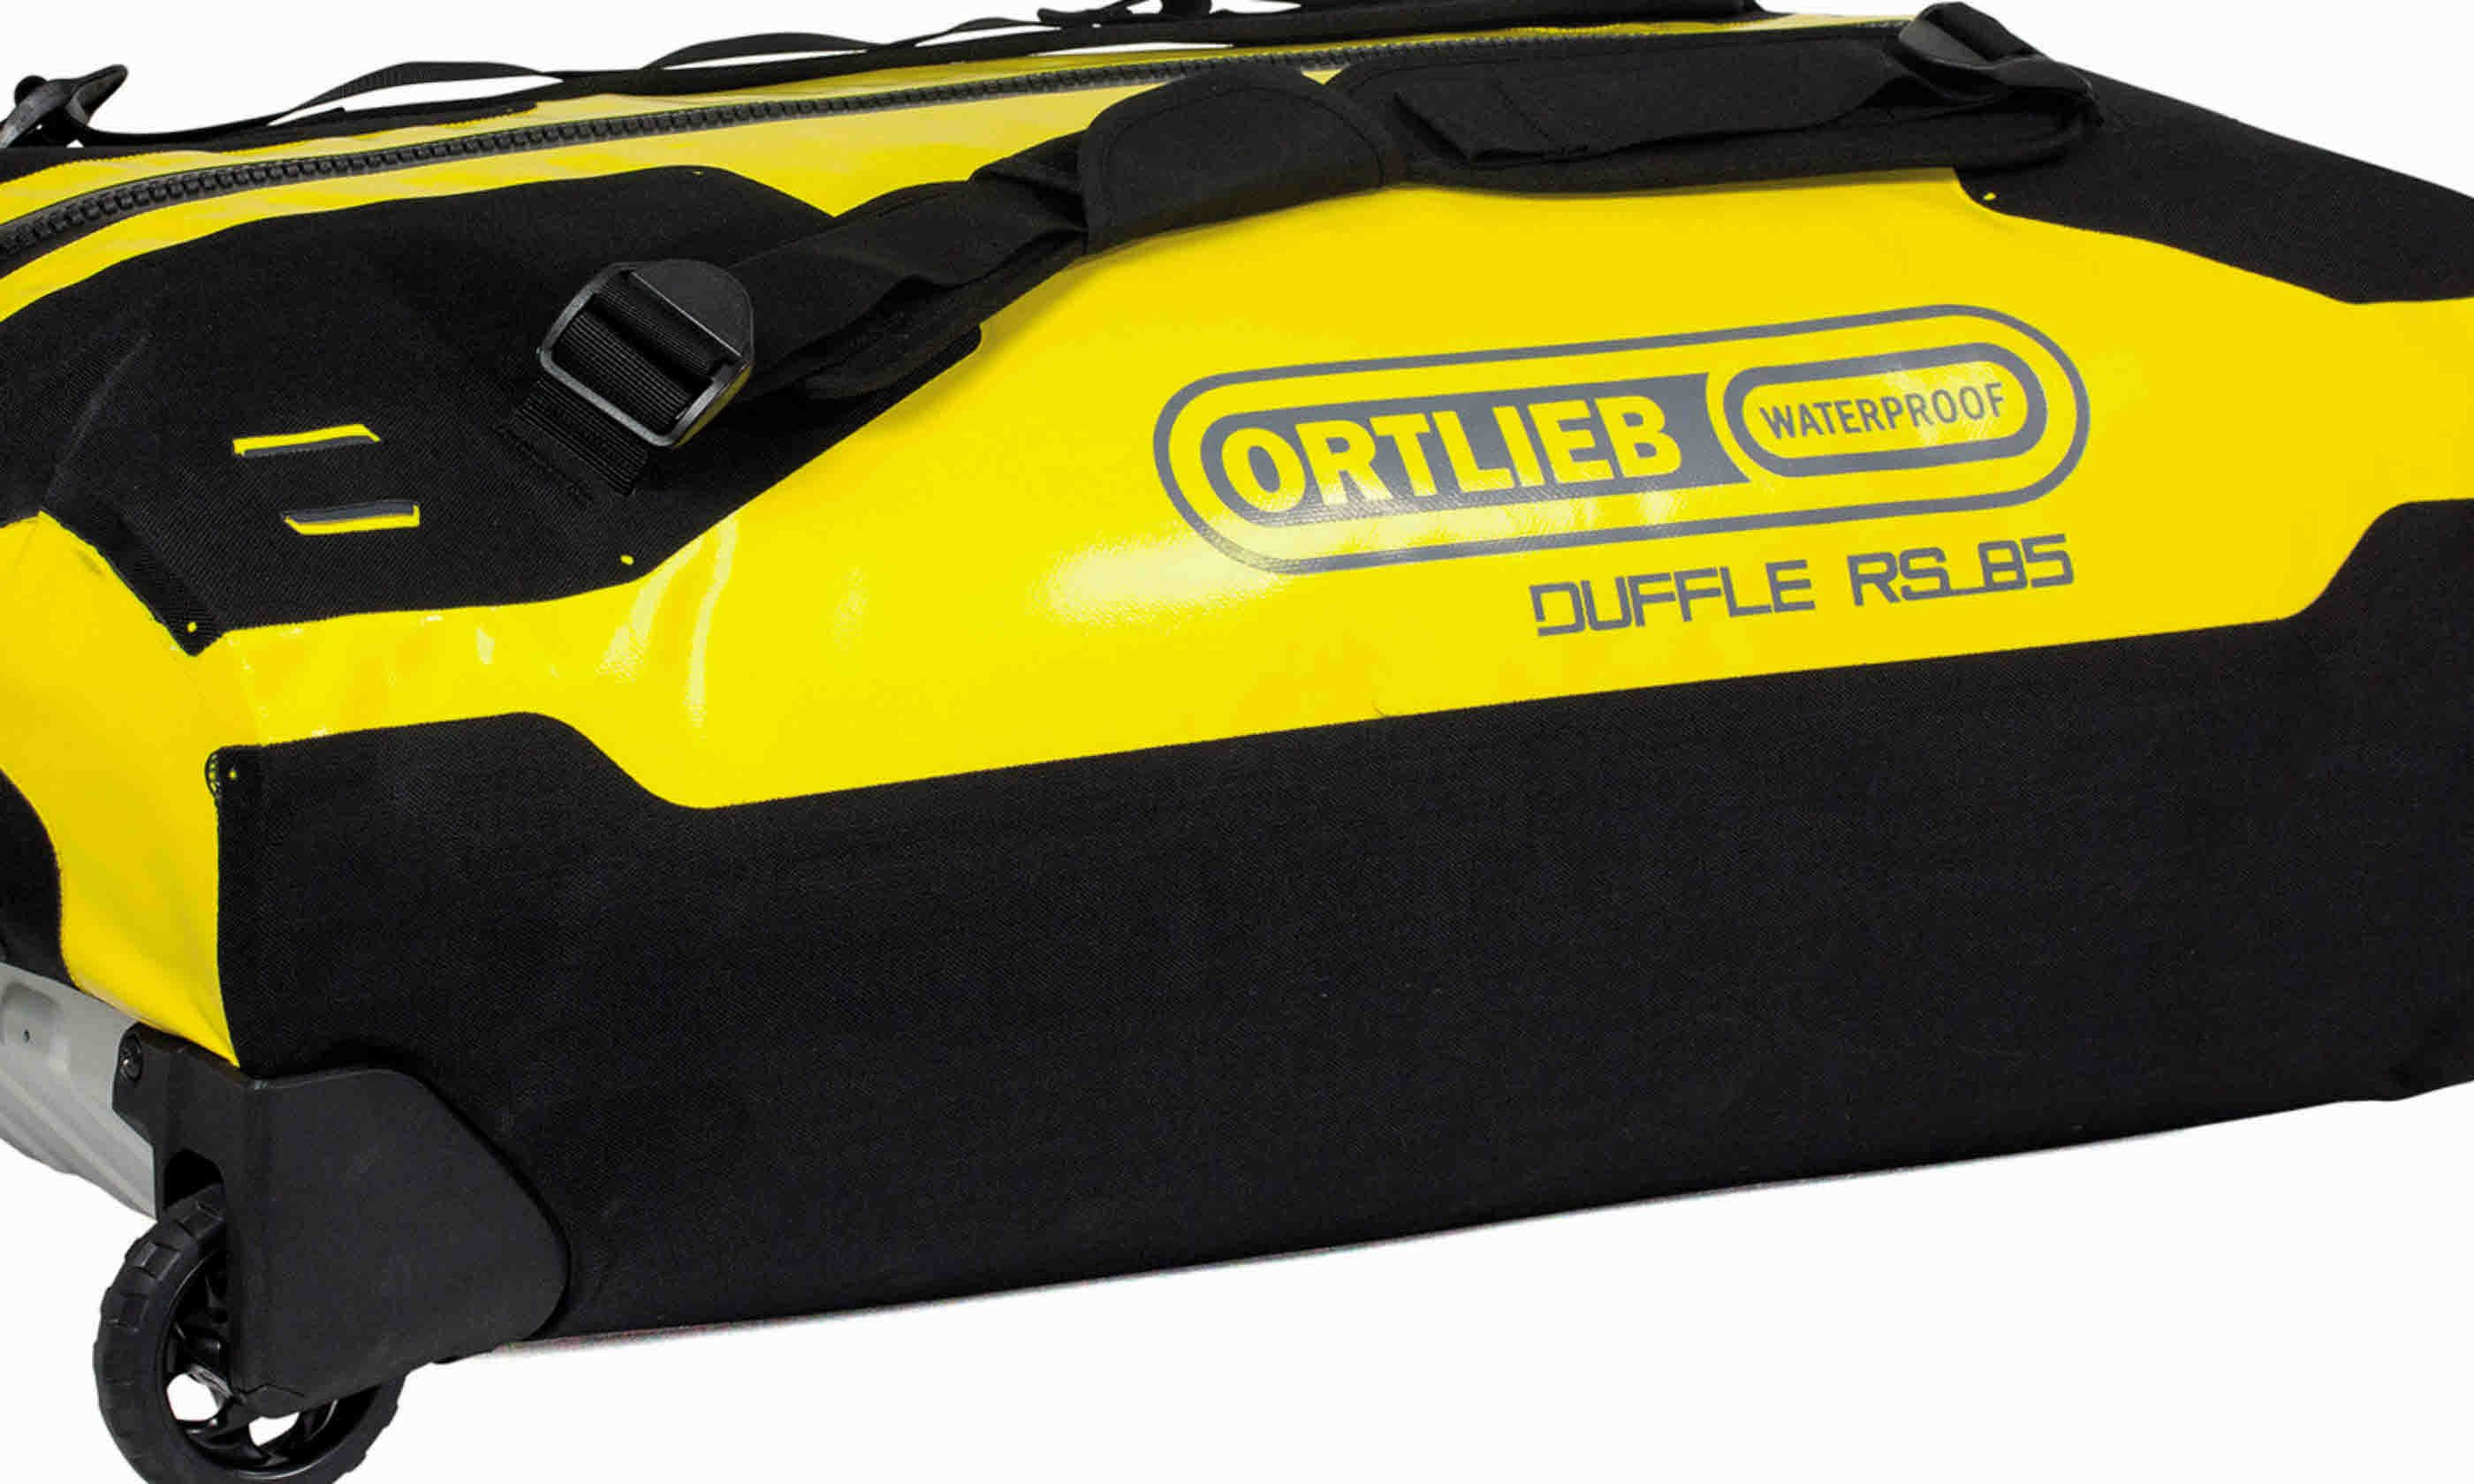 Ortlieb Duffle RS 85L